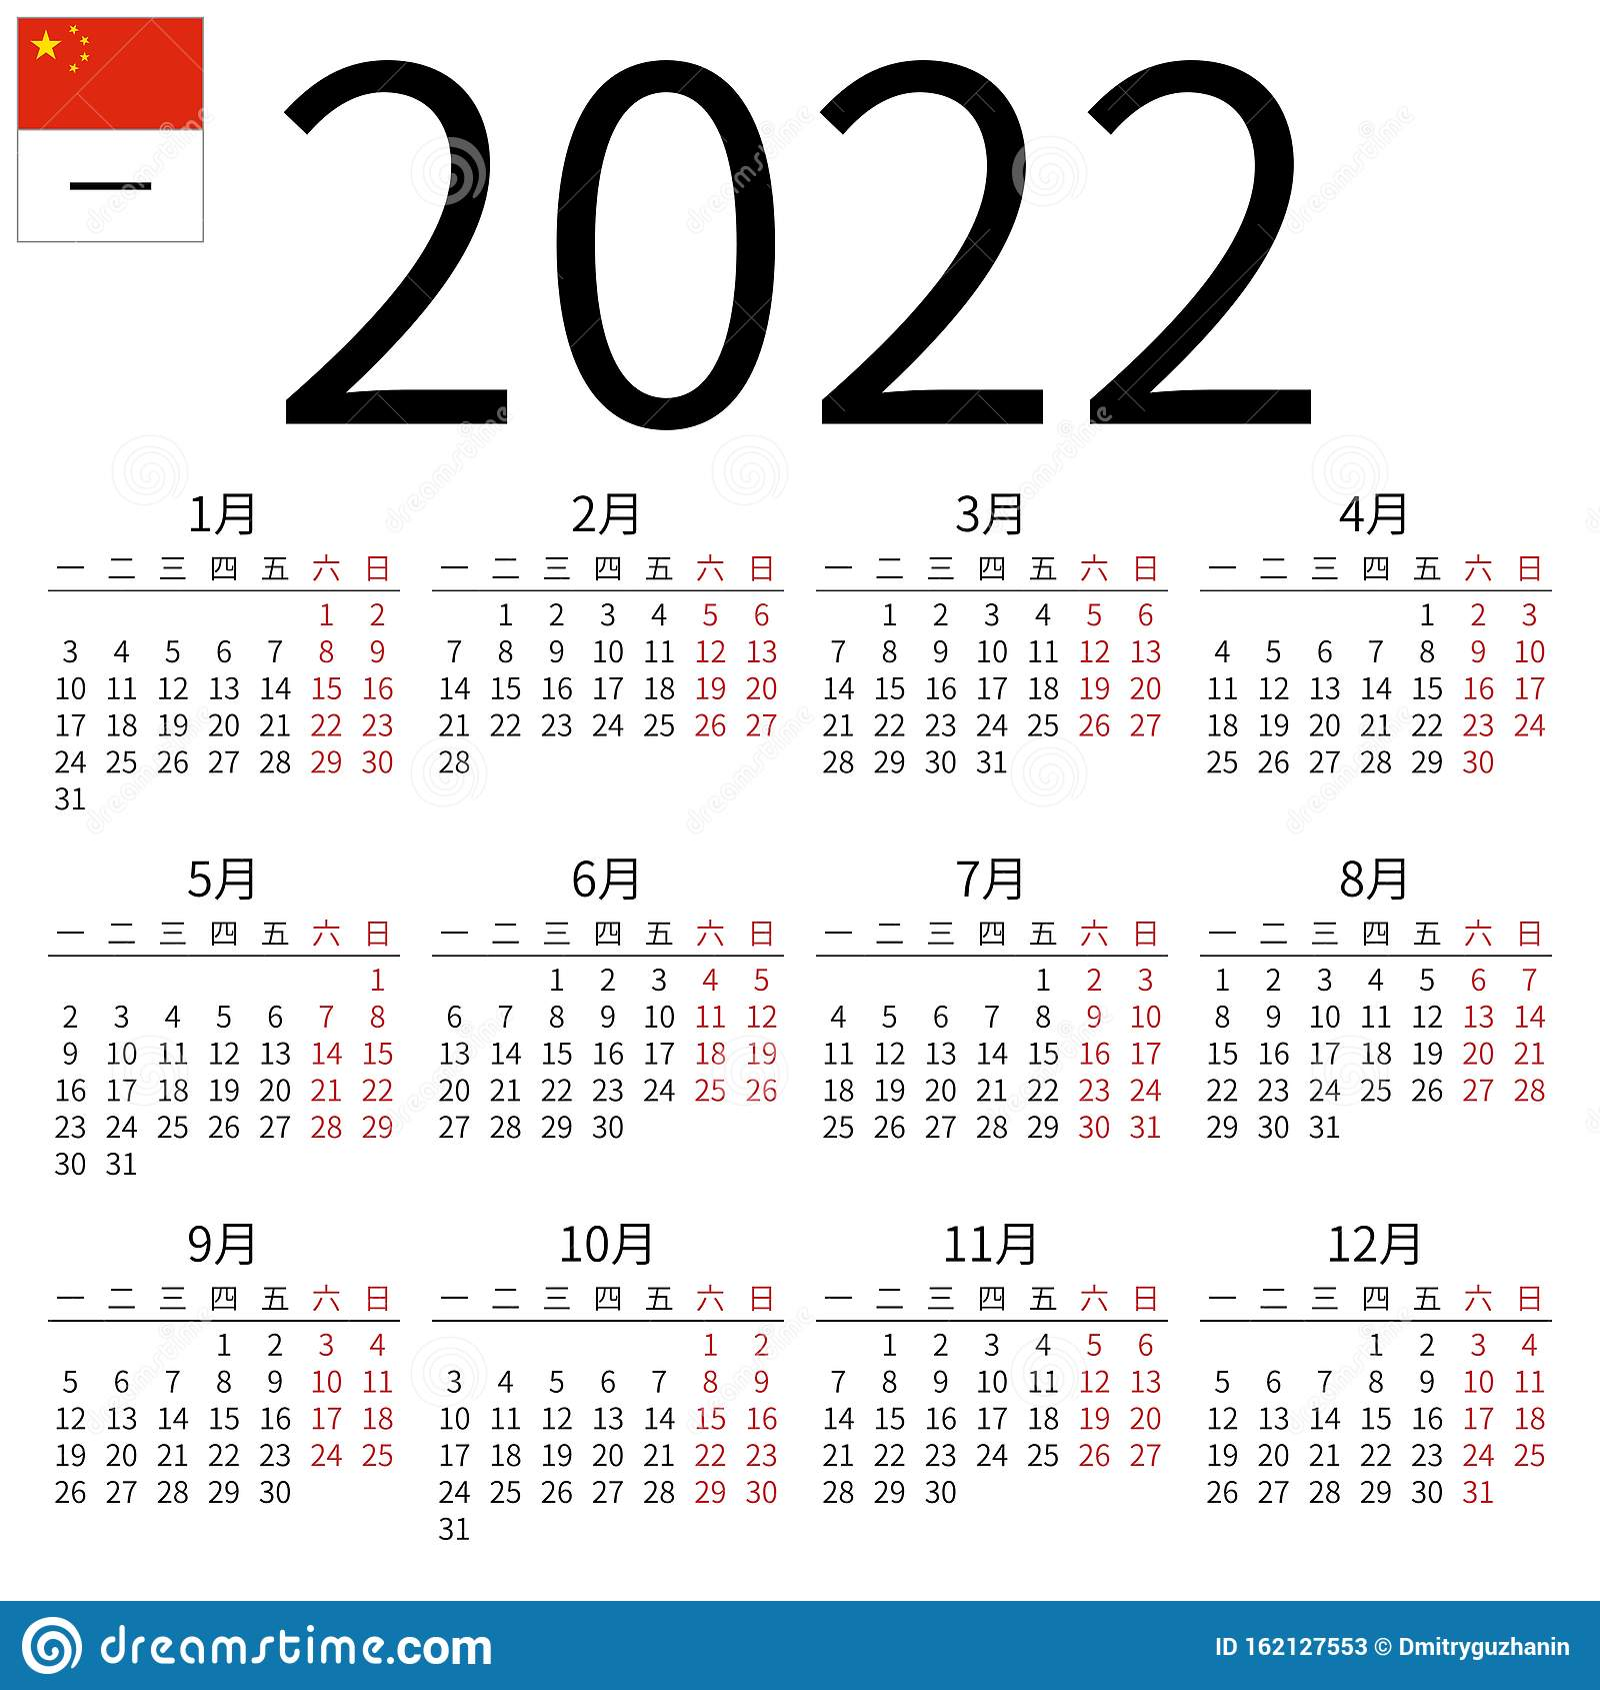 2022 Calendrier Chinois Calendrier 2022, Chinois, Lundi Illustration de Vecteur